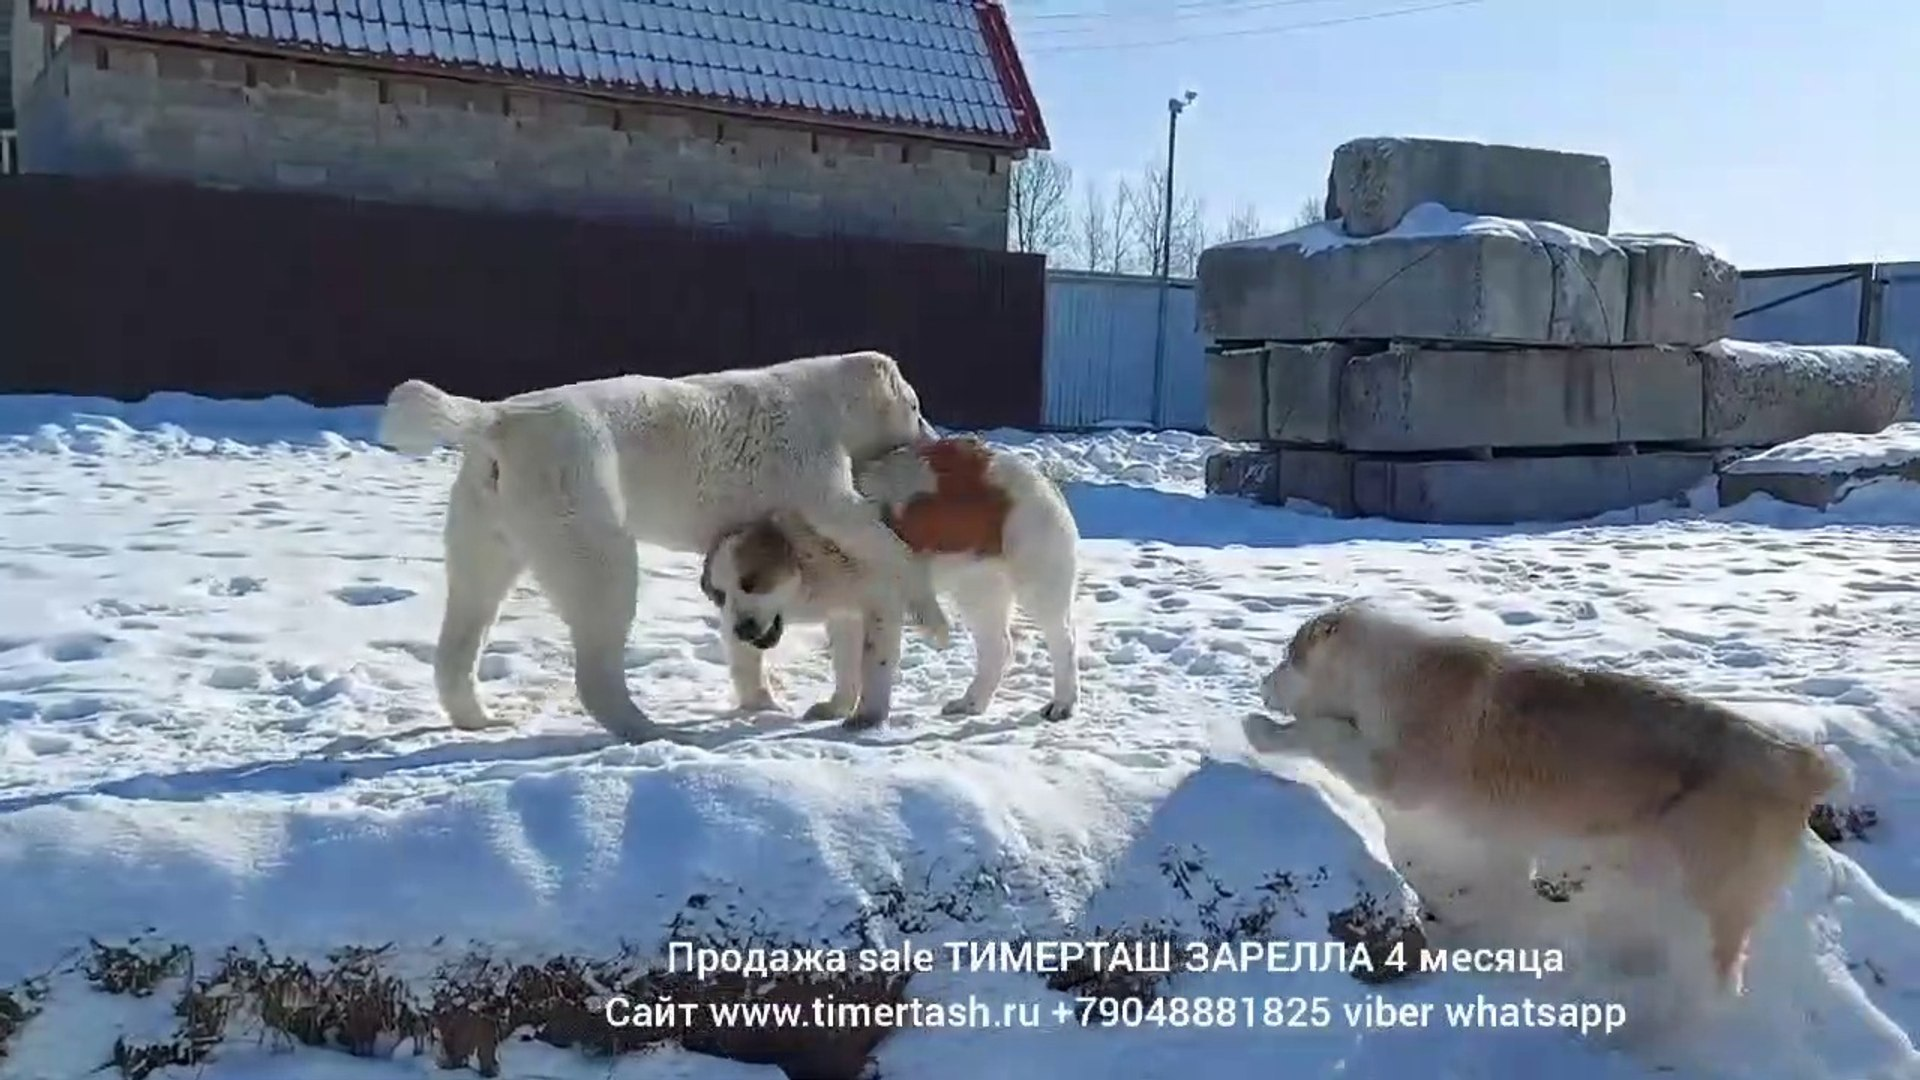 ALABAY YAVRULARININ KAR OYUNU - ALABAi SHEPHERD DOG SNOW GAMES